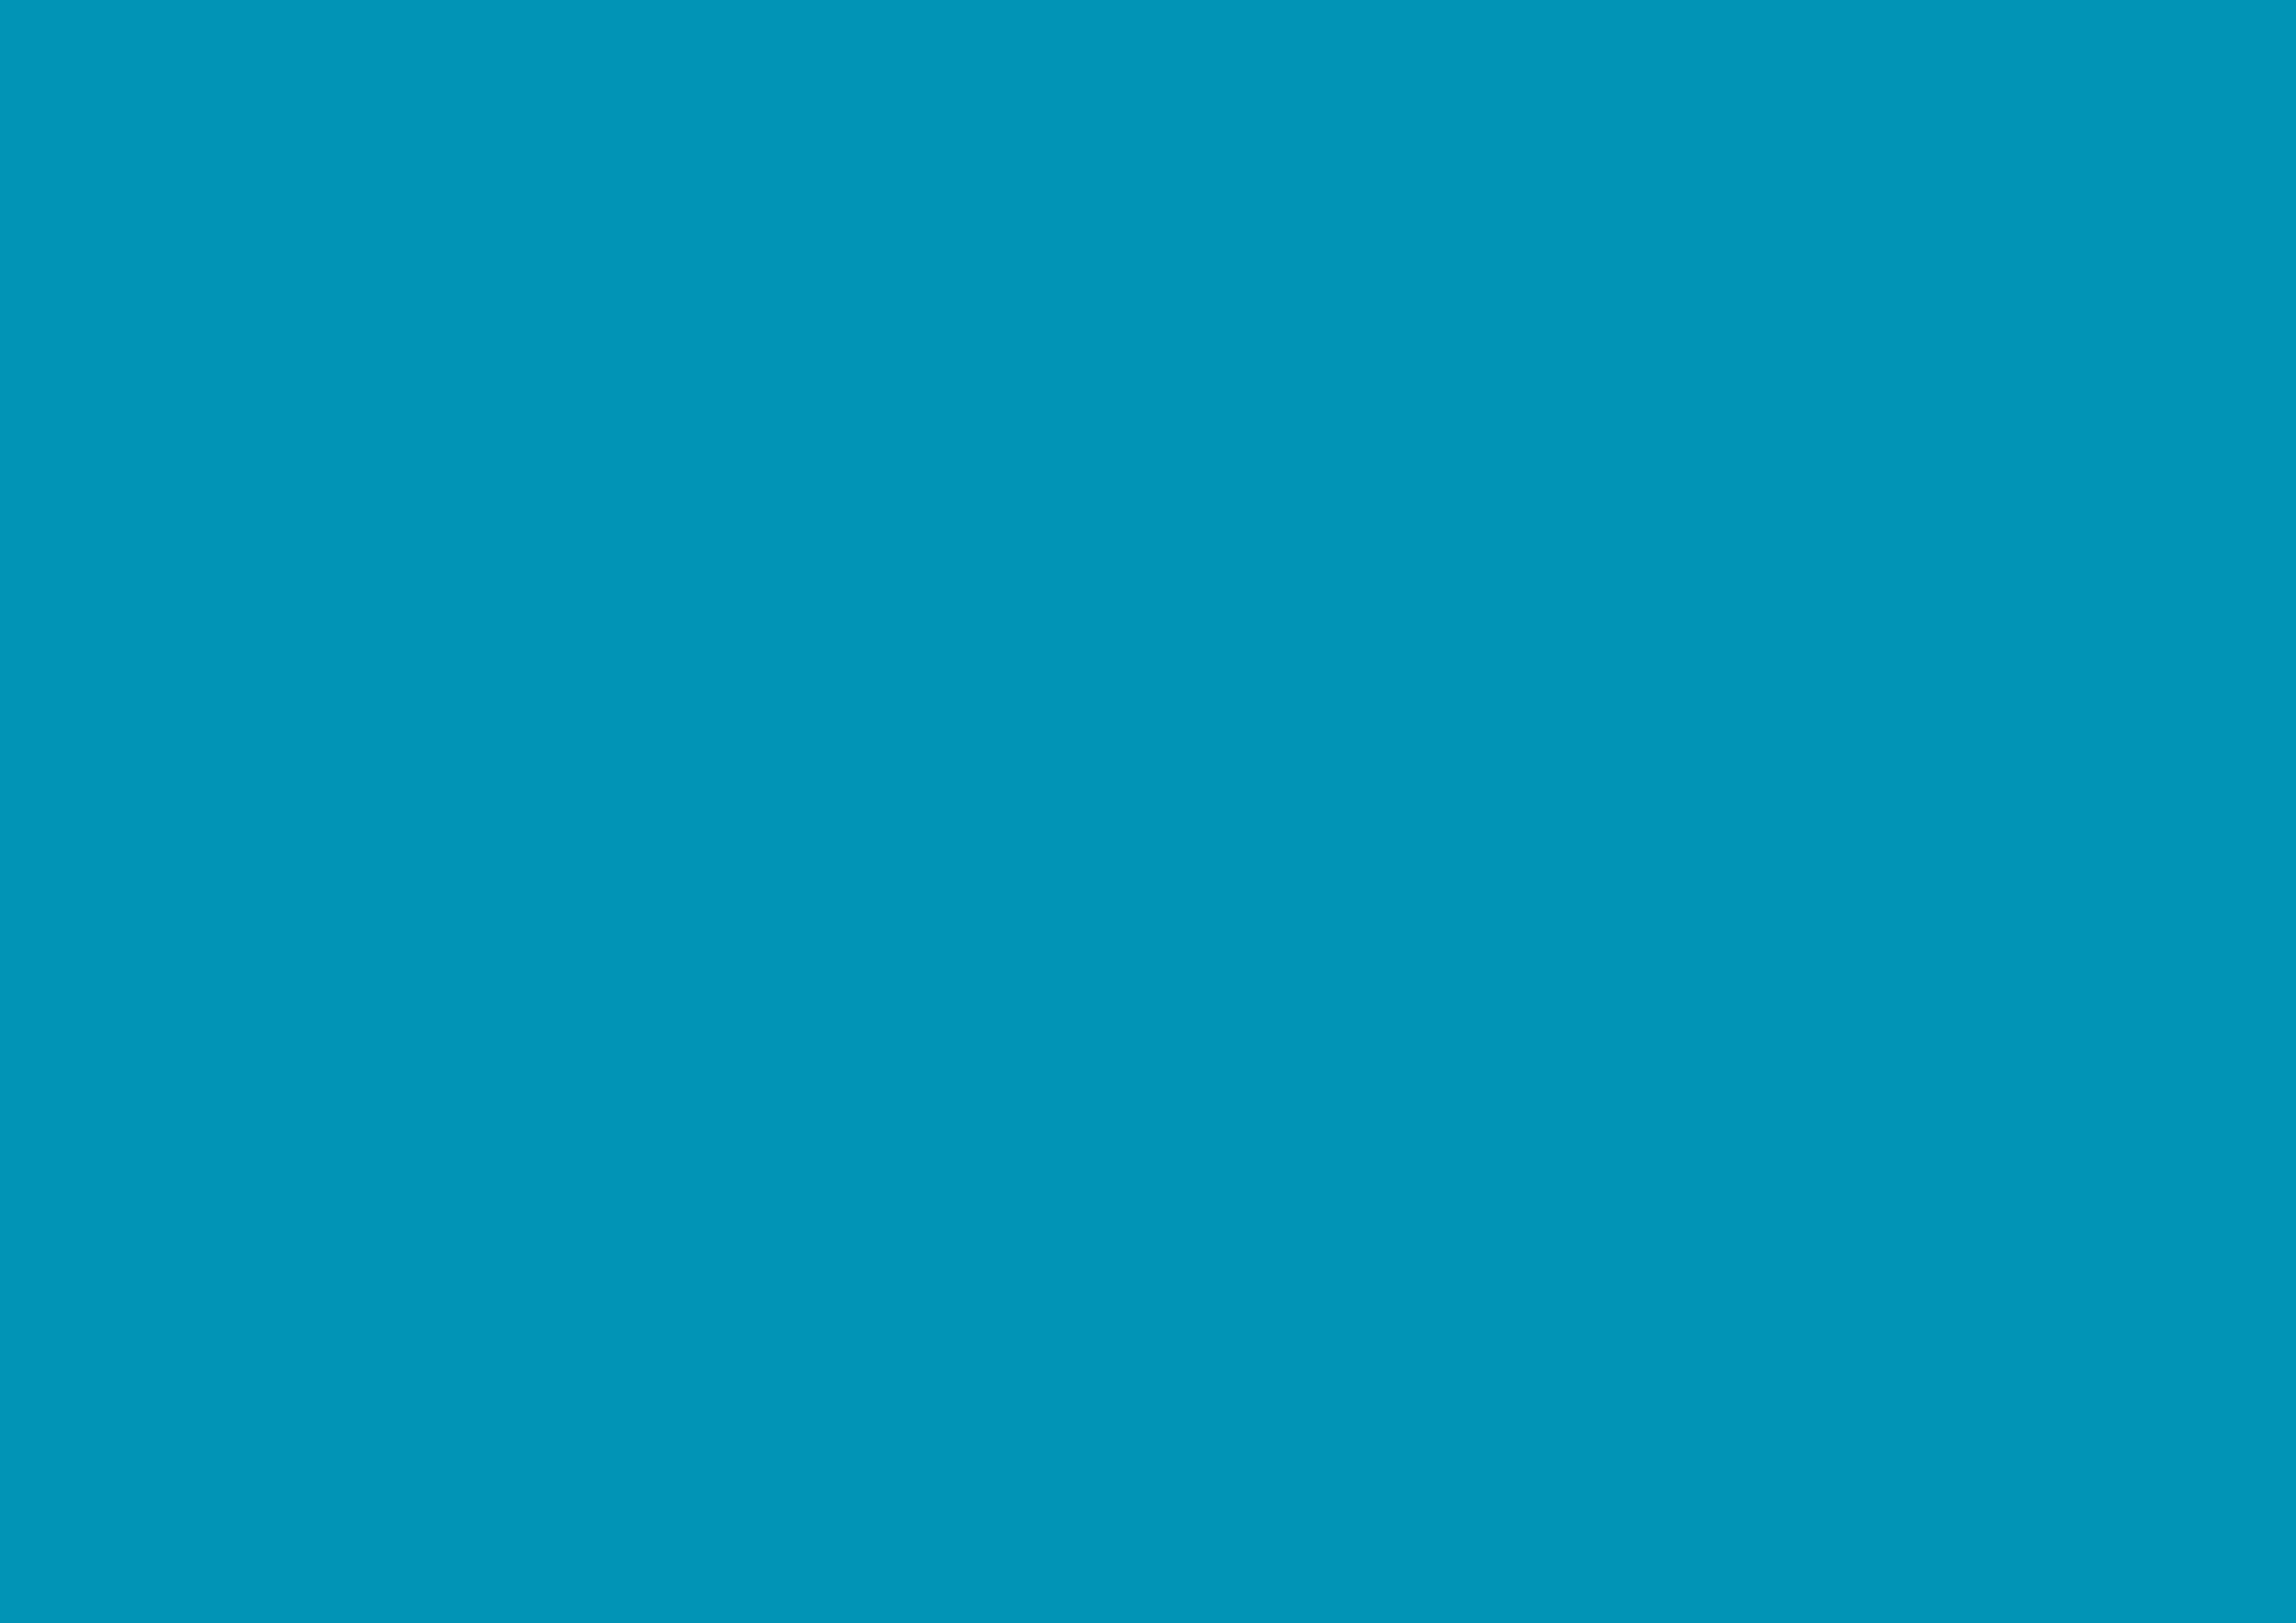 3508x2480 Bondi Blue Solid Color Background